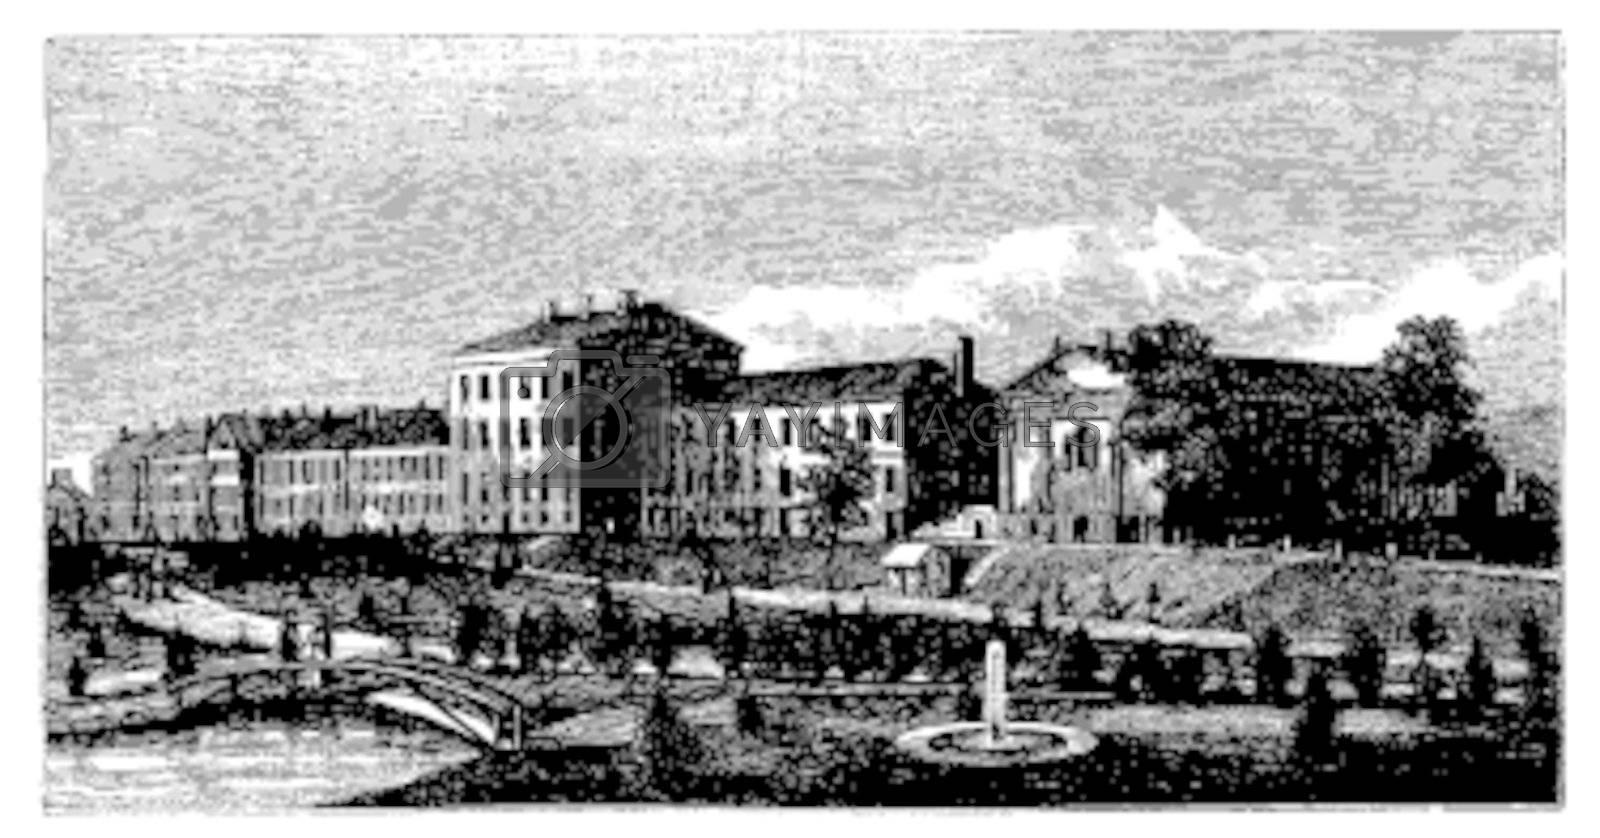 United States Naval Academy in Annapolis, Maryland, USA, vintage engraved illustration. Trousset encyclopedia (1886 - 1891).